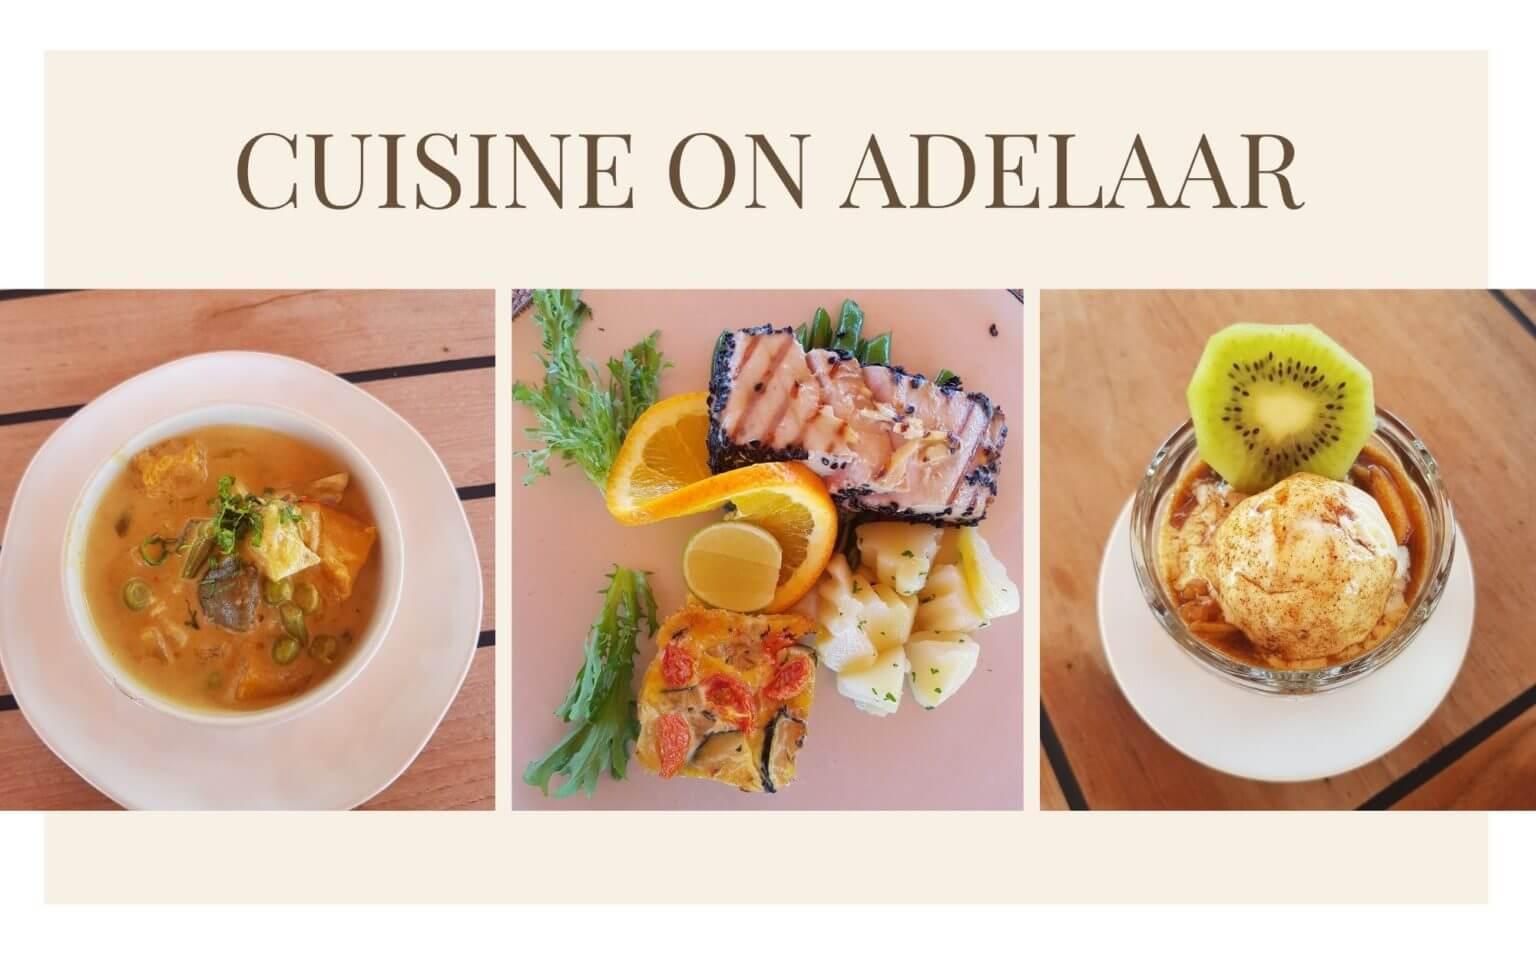 Liveaboard experience cuisine